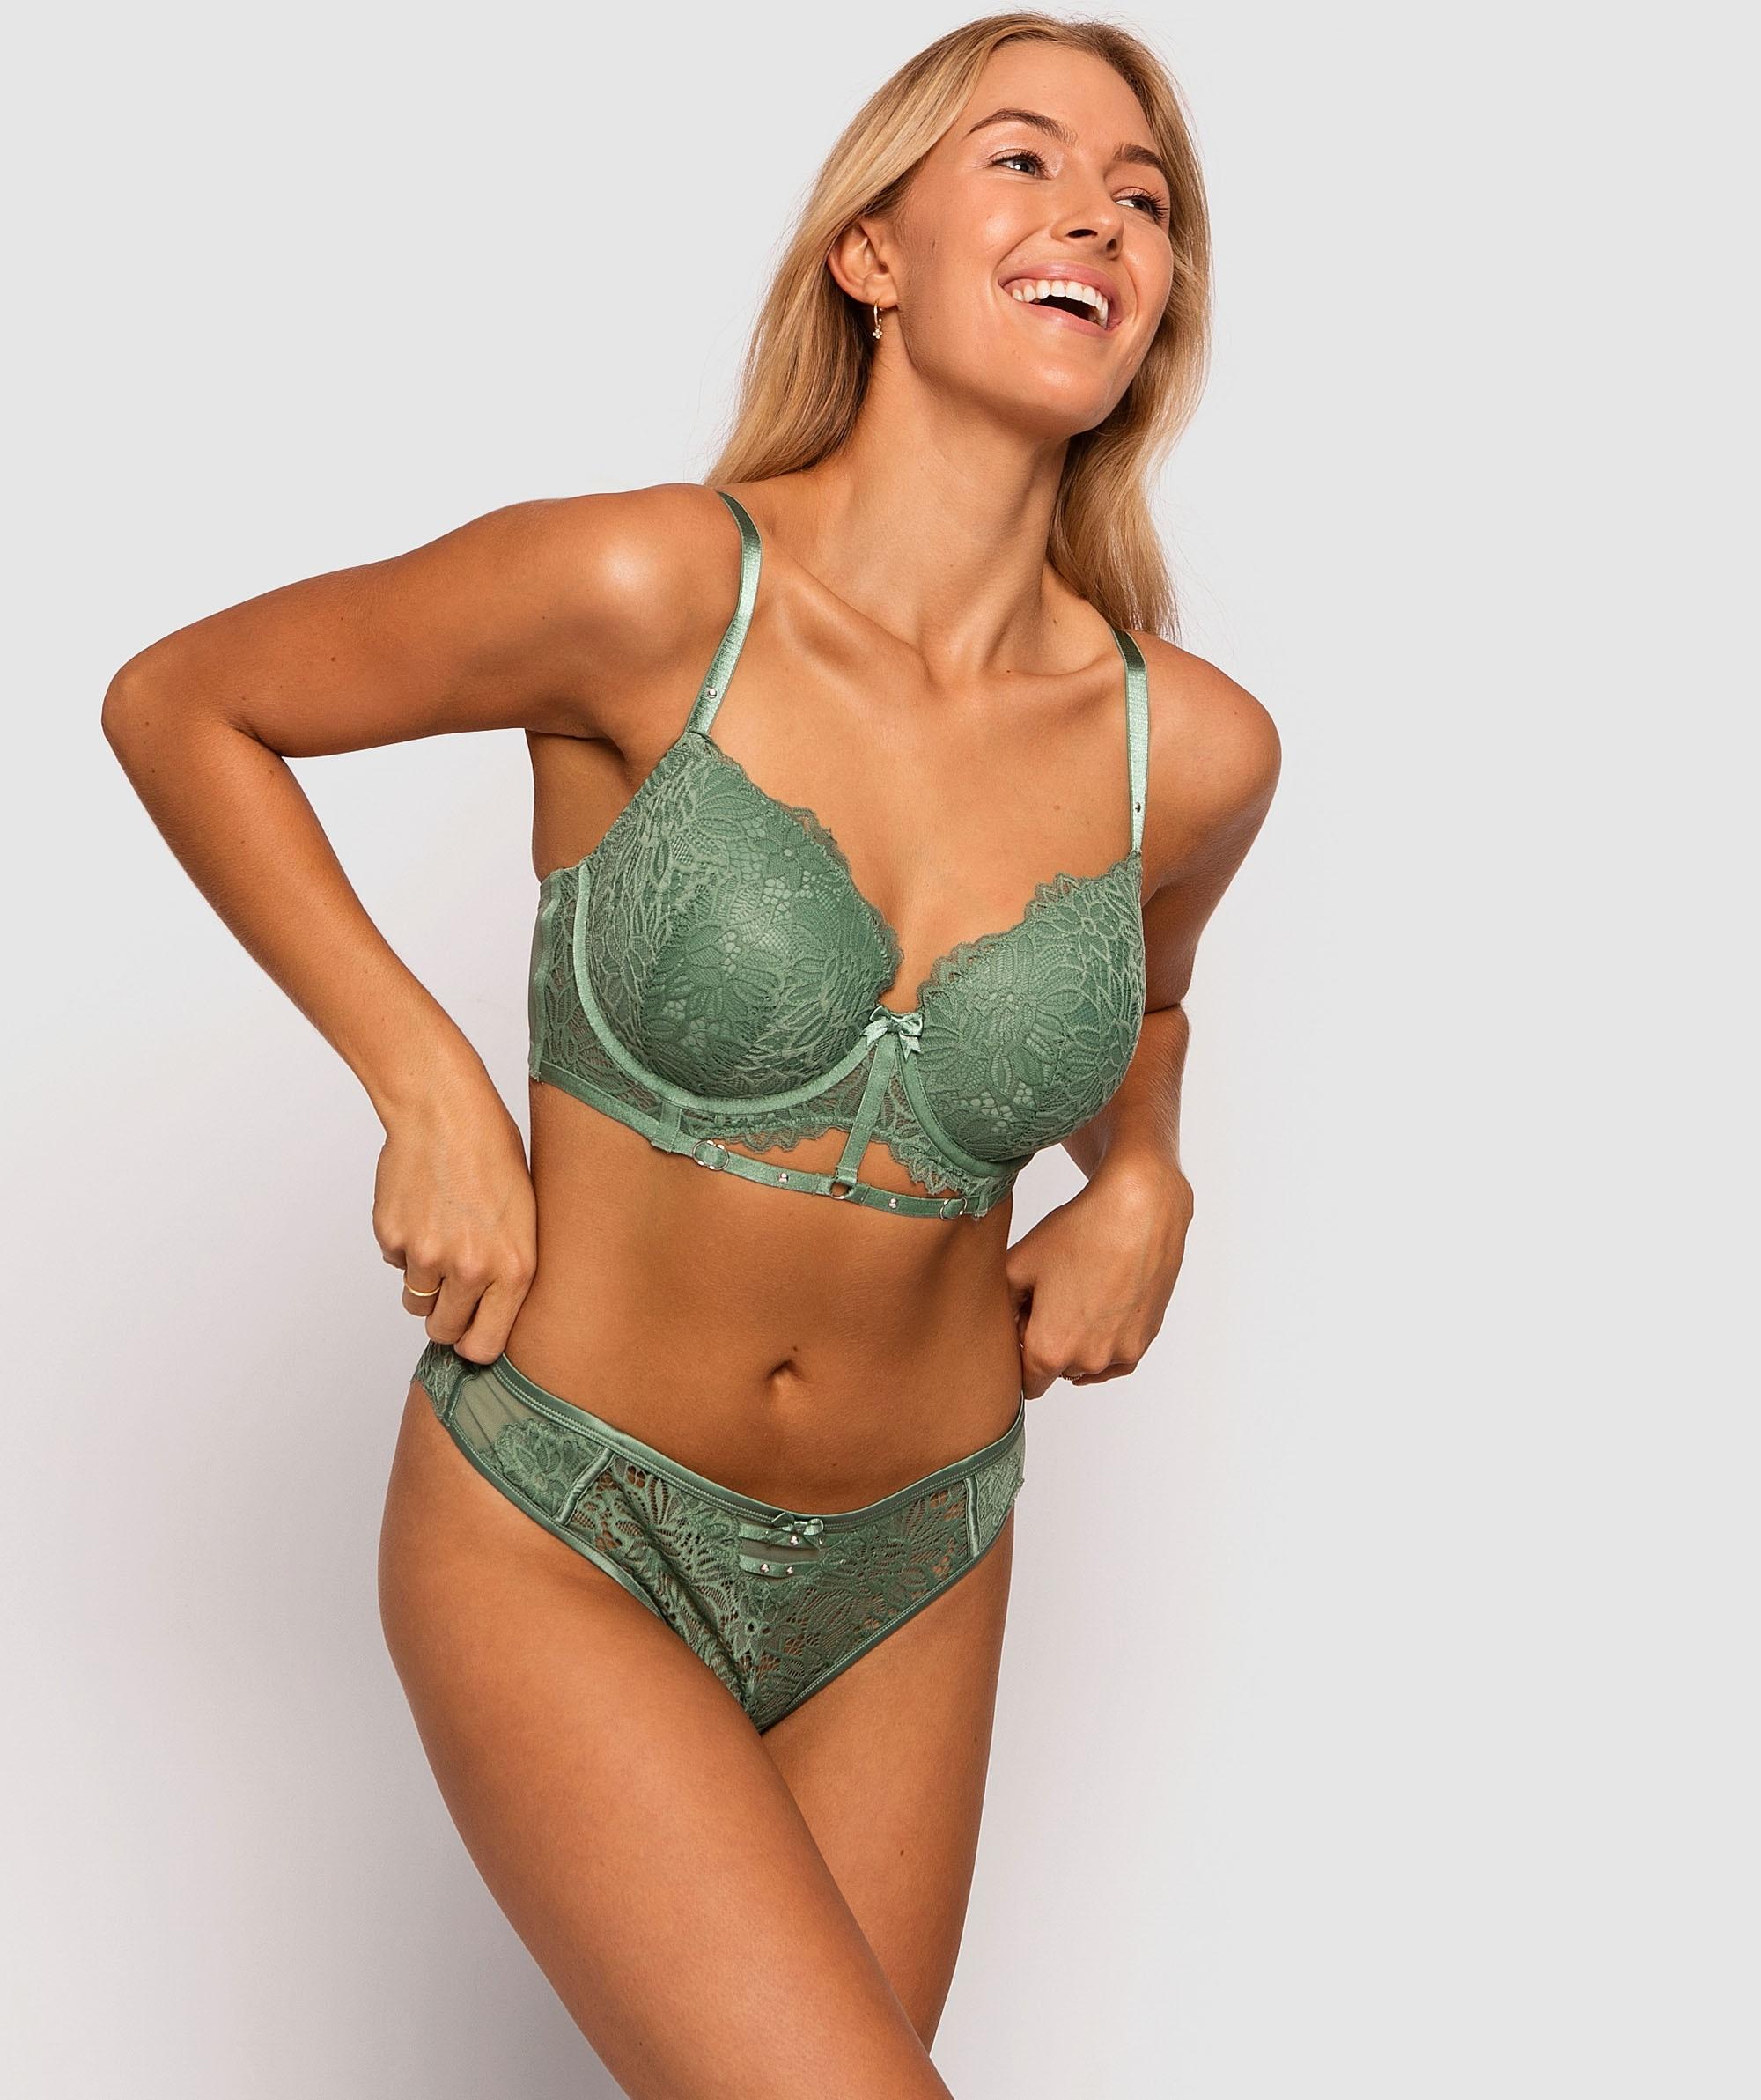 Kendra Brazilian Knicker - Khaki